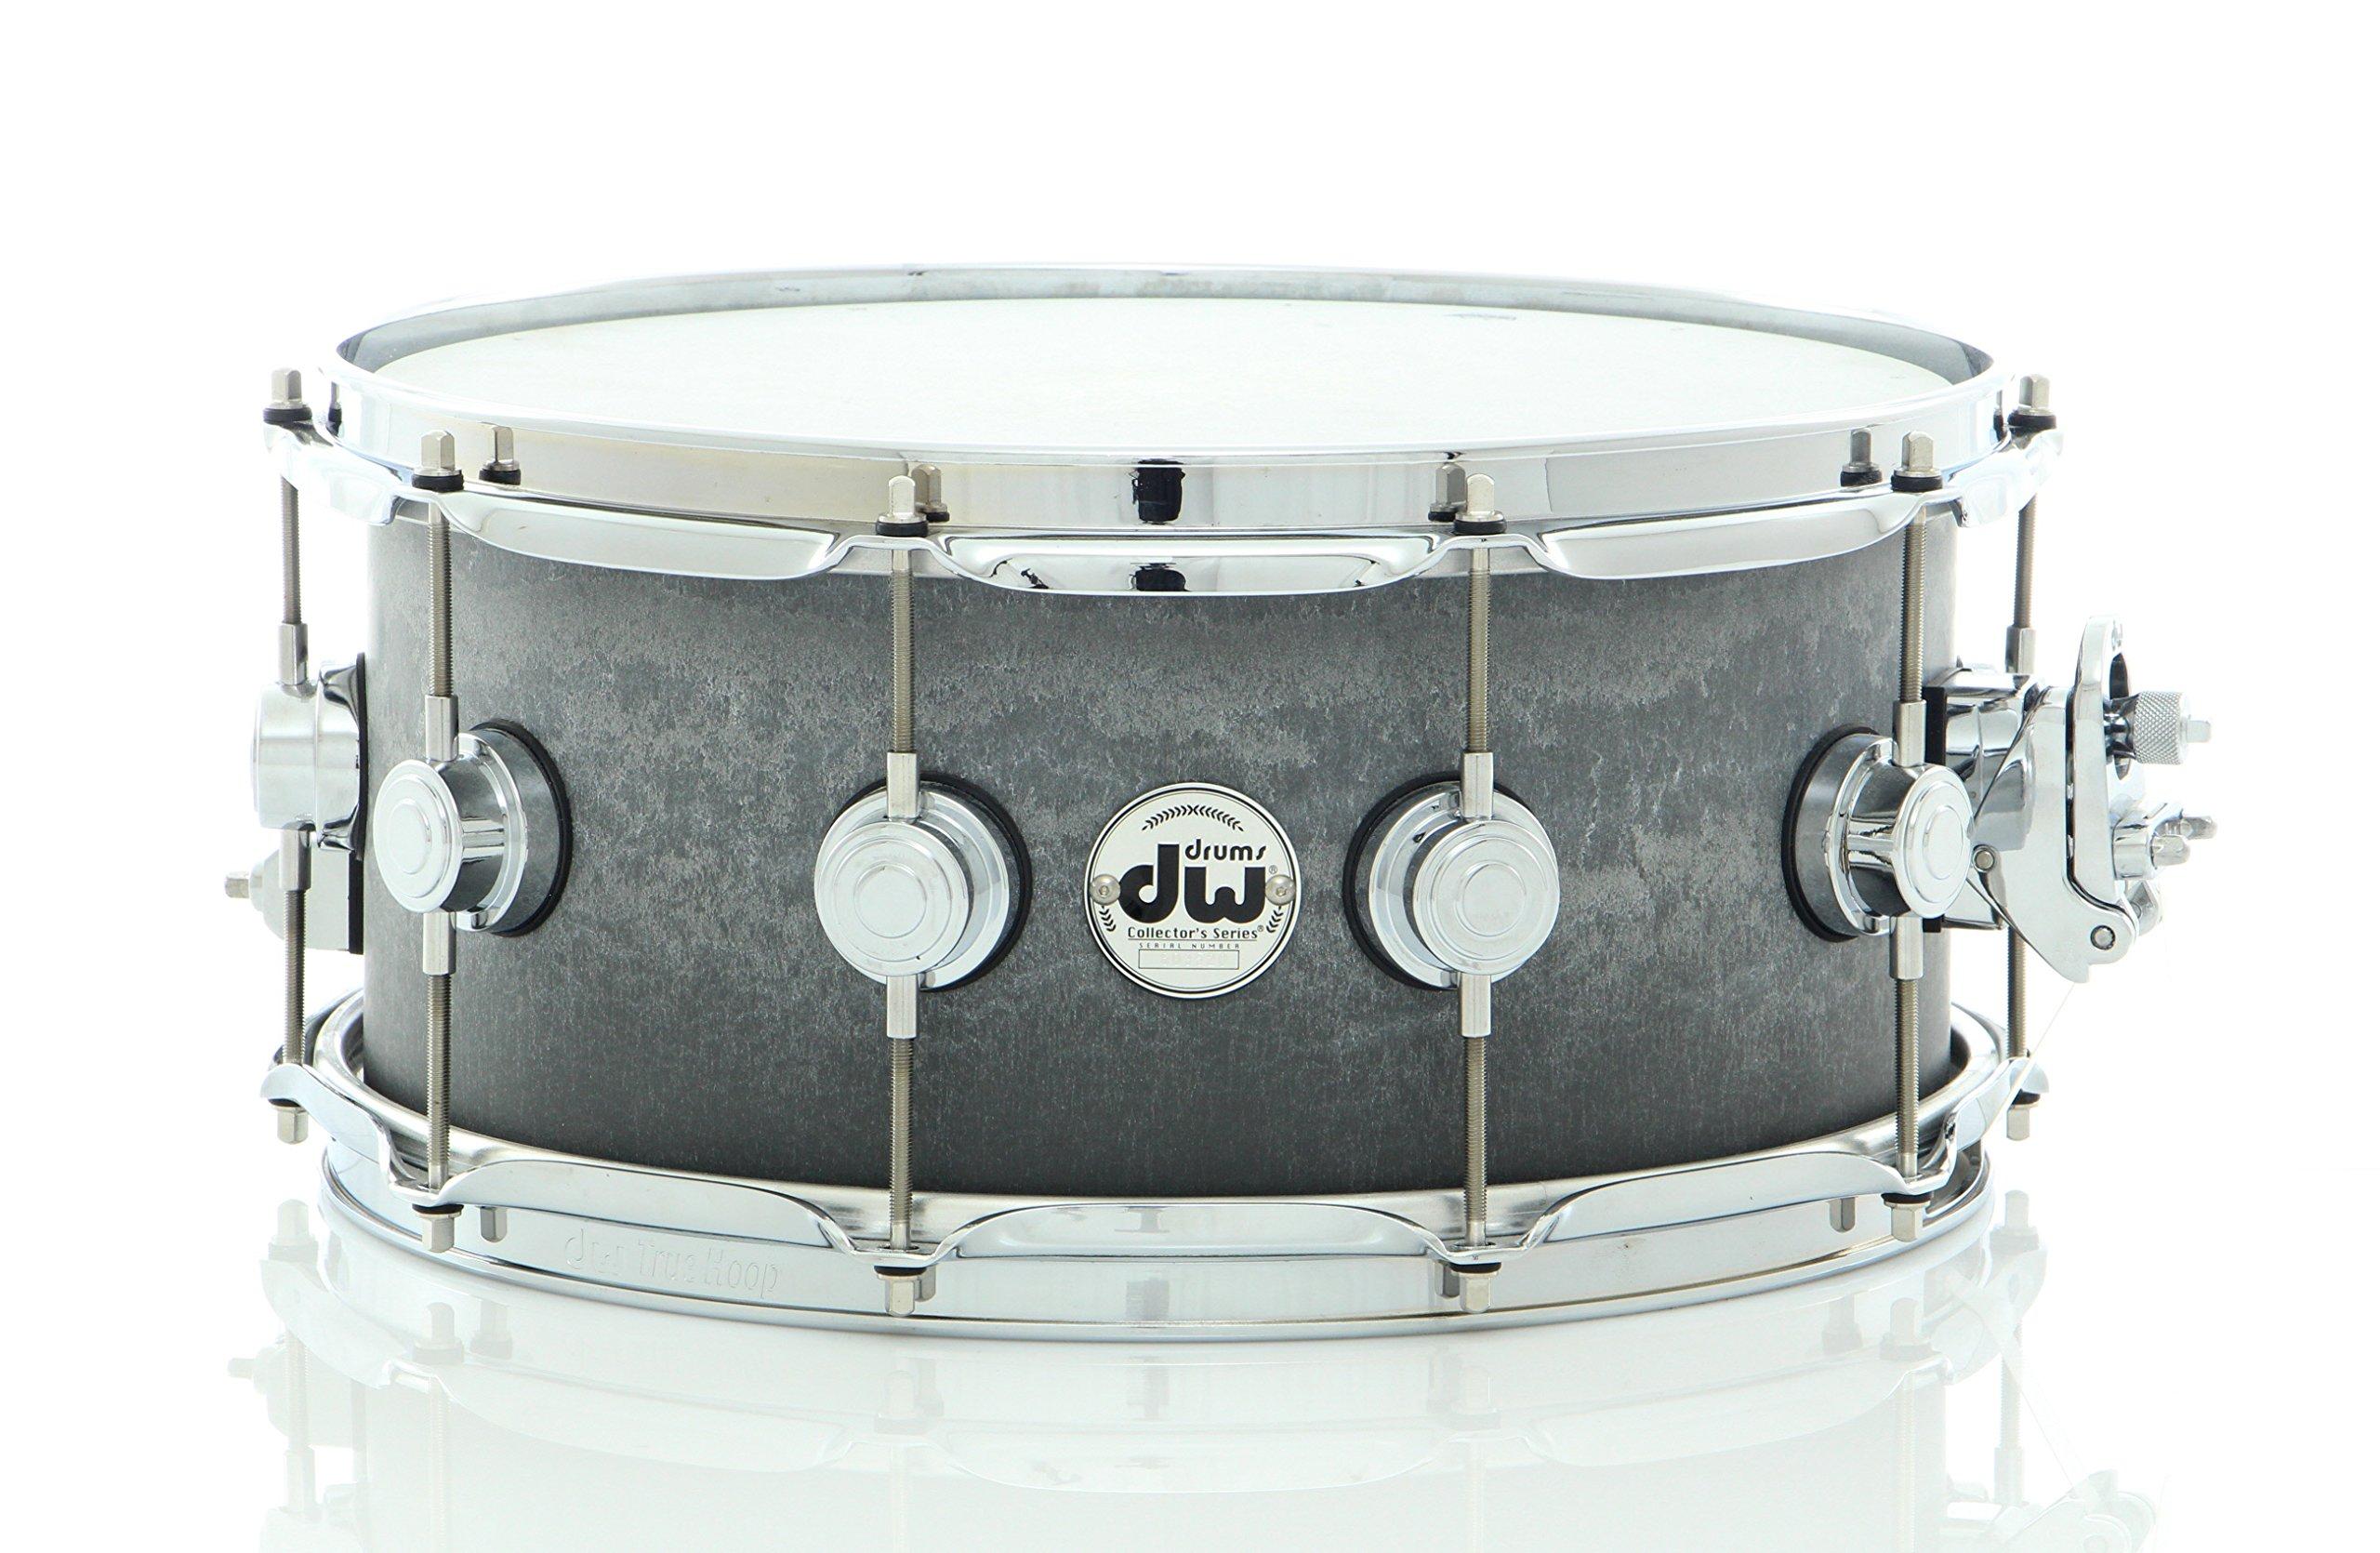 DW Concrete Snare Drum 14 x 6.5 in. Satin Chrome Hardware